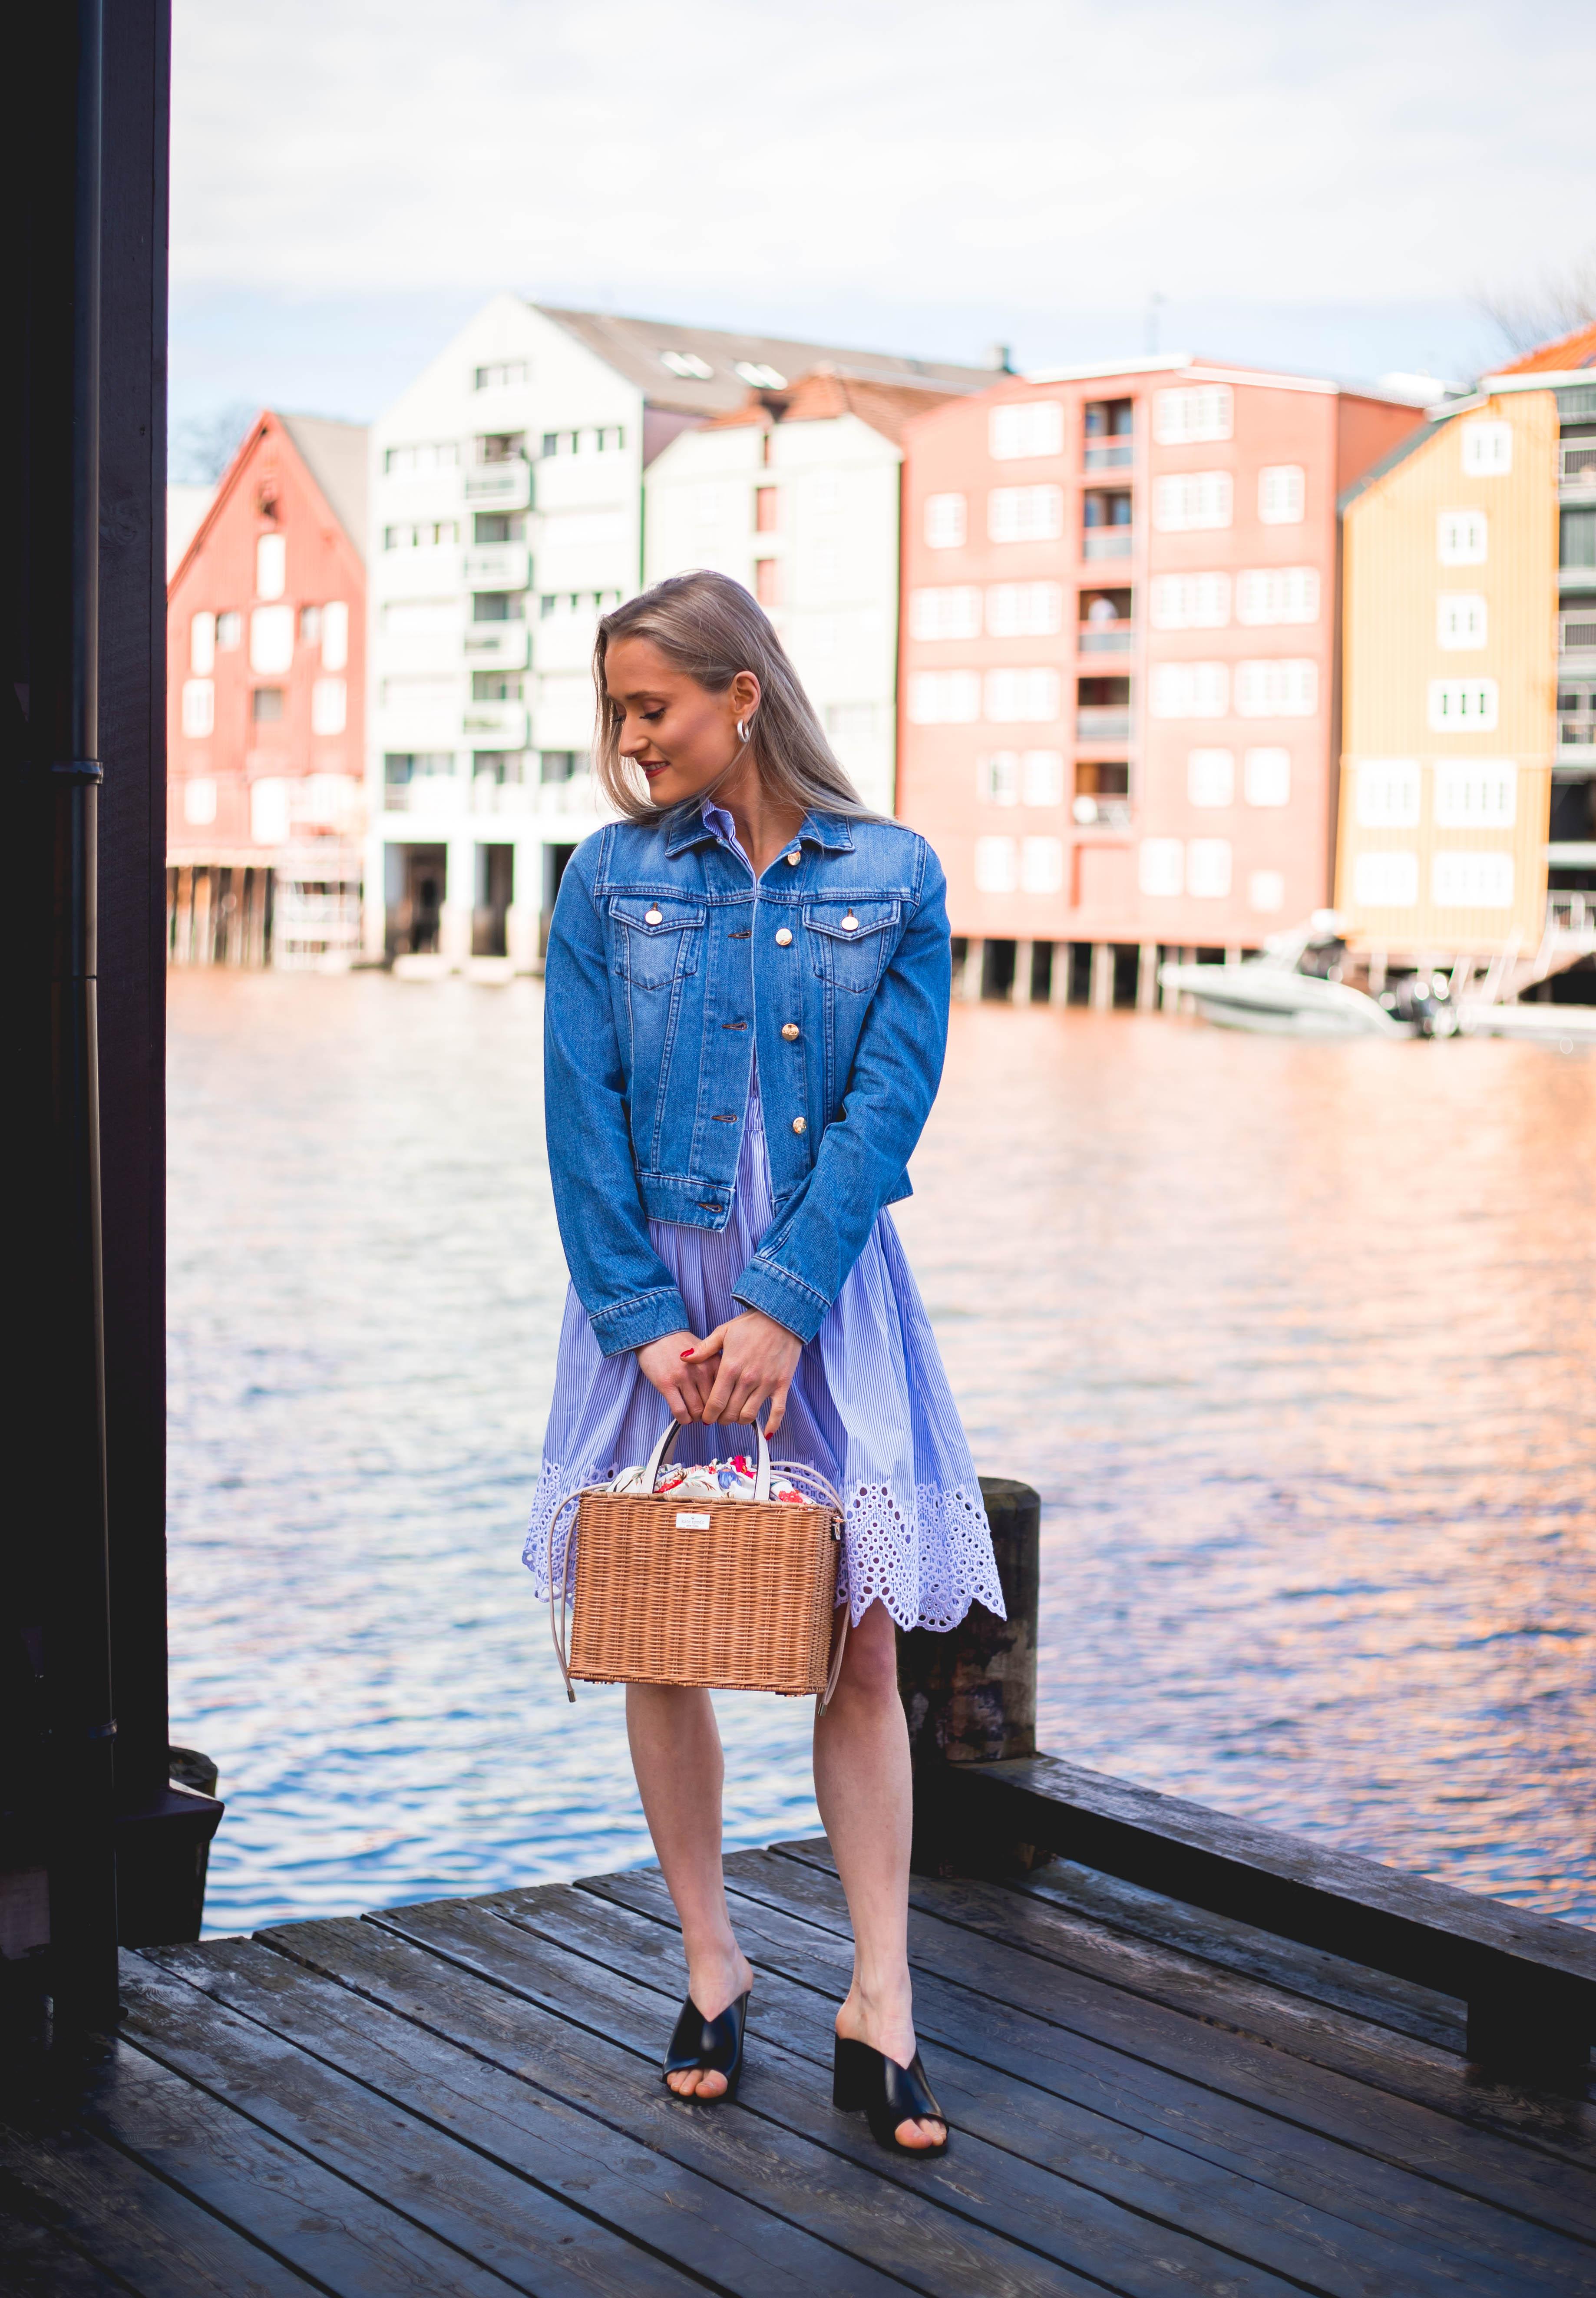 Fall Winter Spring Summer – Høyerblogg Trondheim | Upgrading